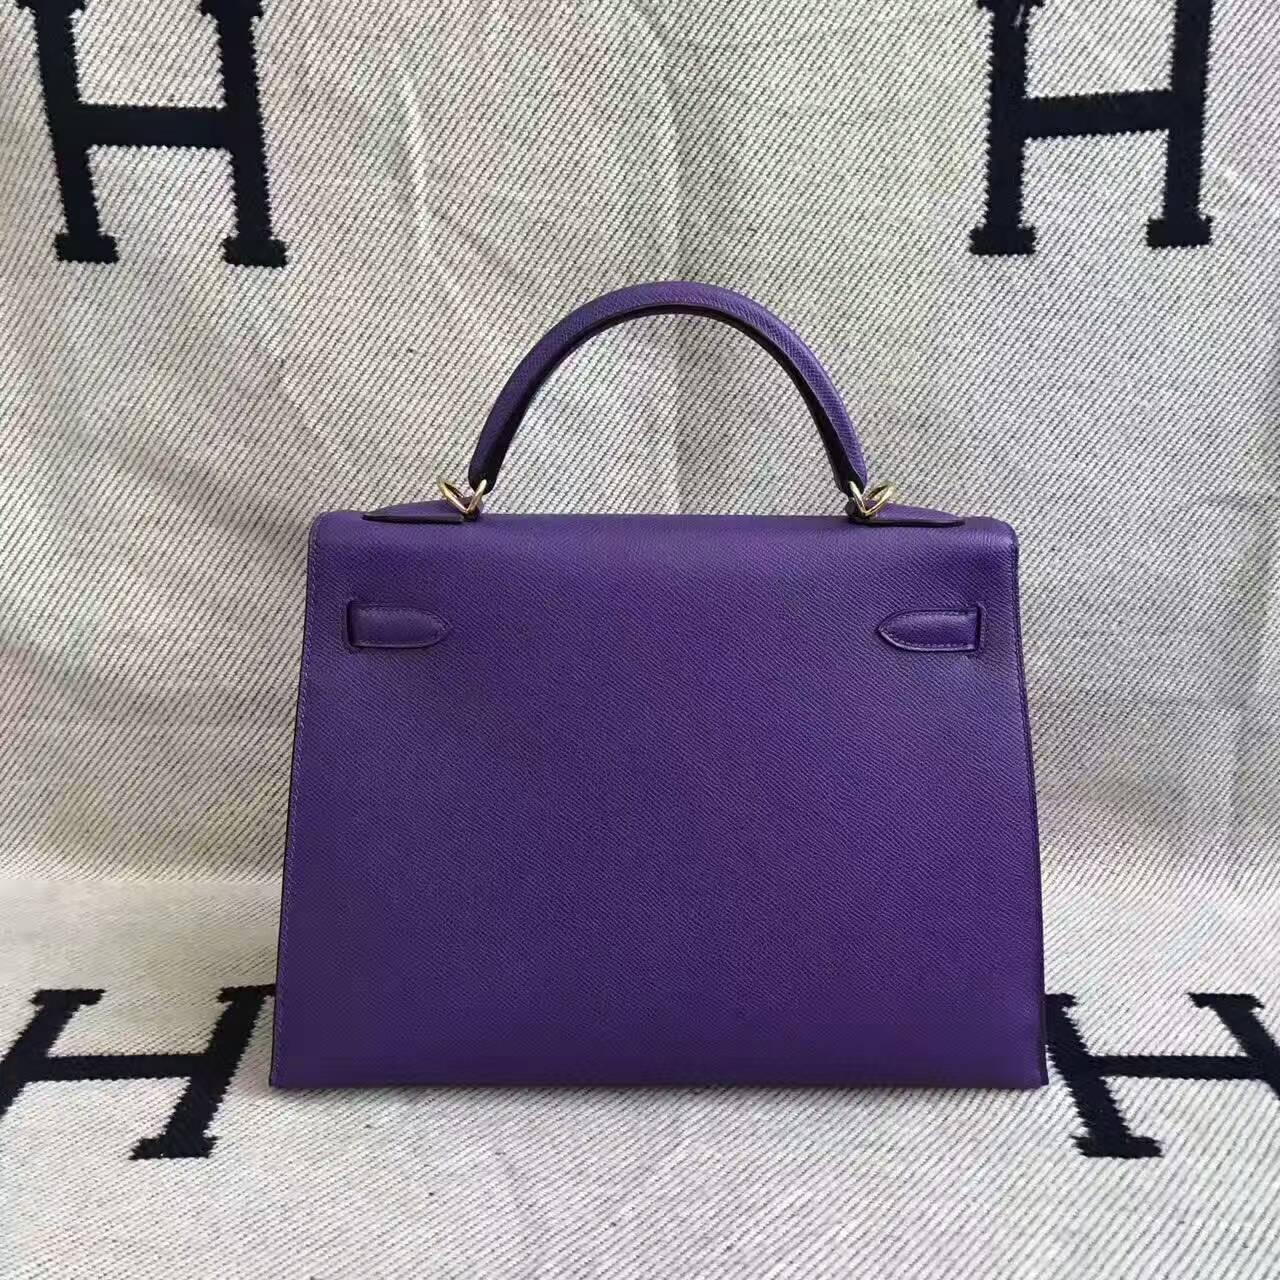 Wholesale Hermes 9W Violet Epsom Leather Sellier Kelly Bag 32CM